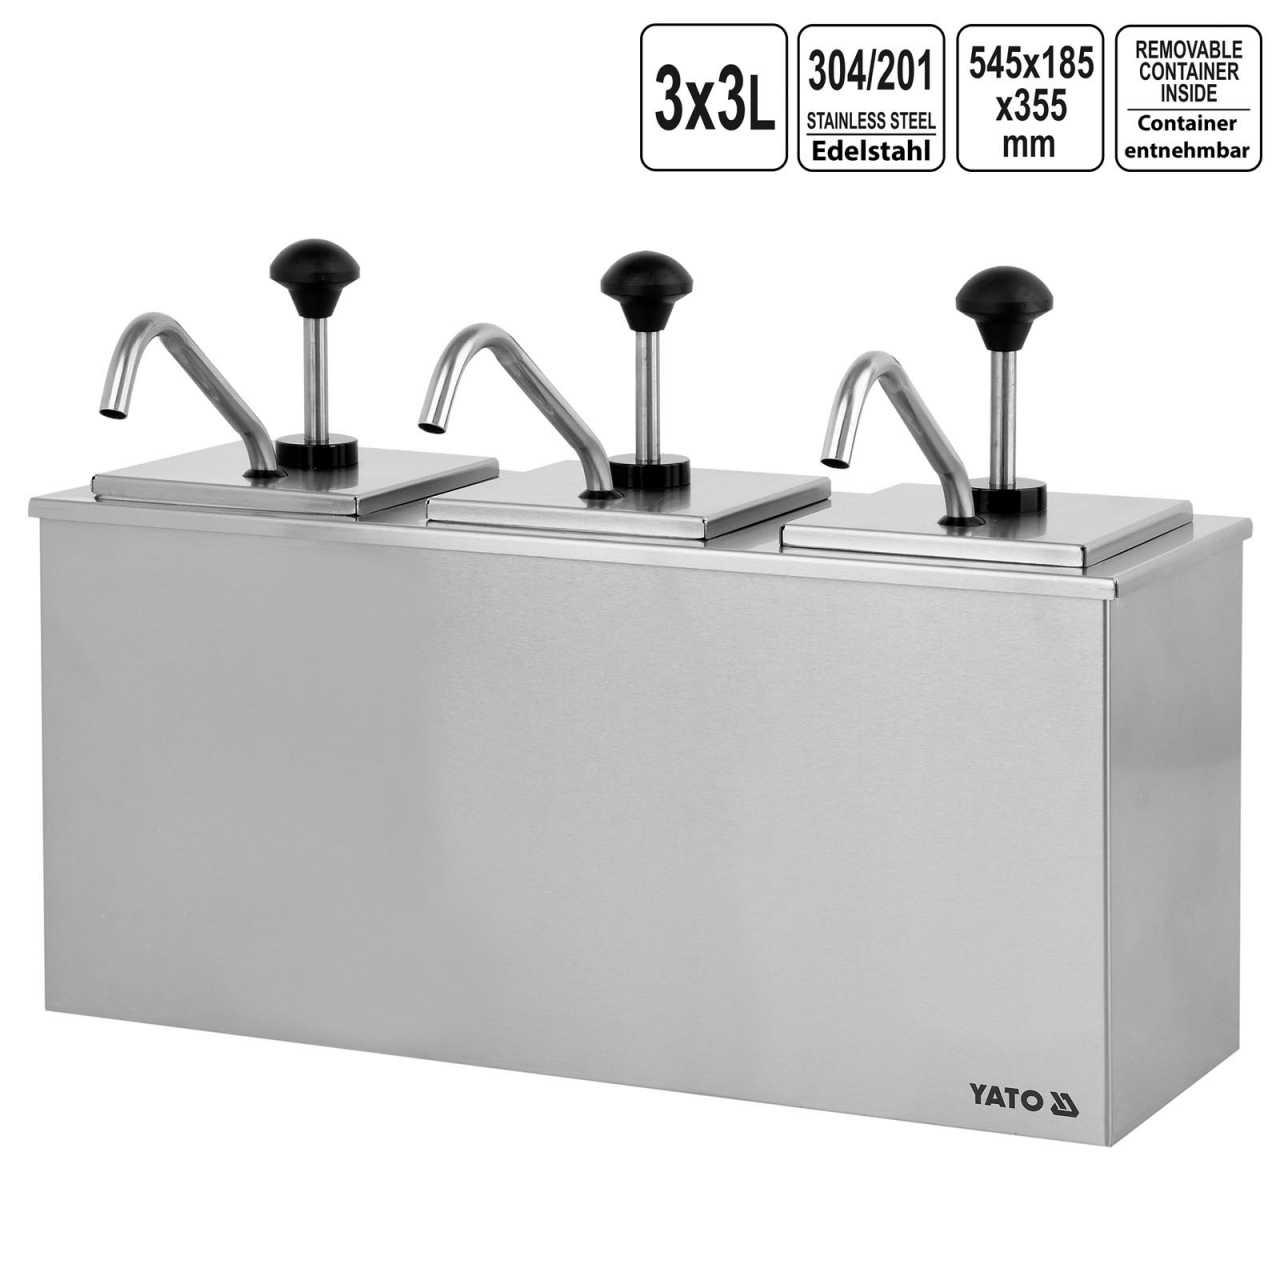 Yato Saucen Spender 3x3L Edelstahl